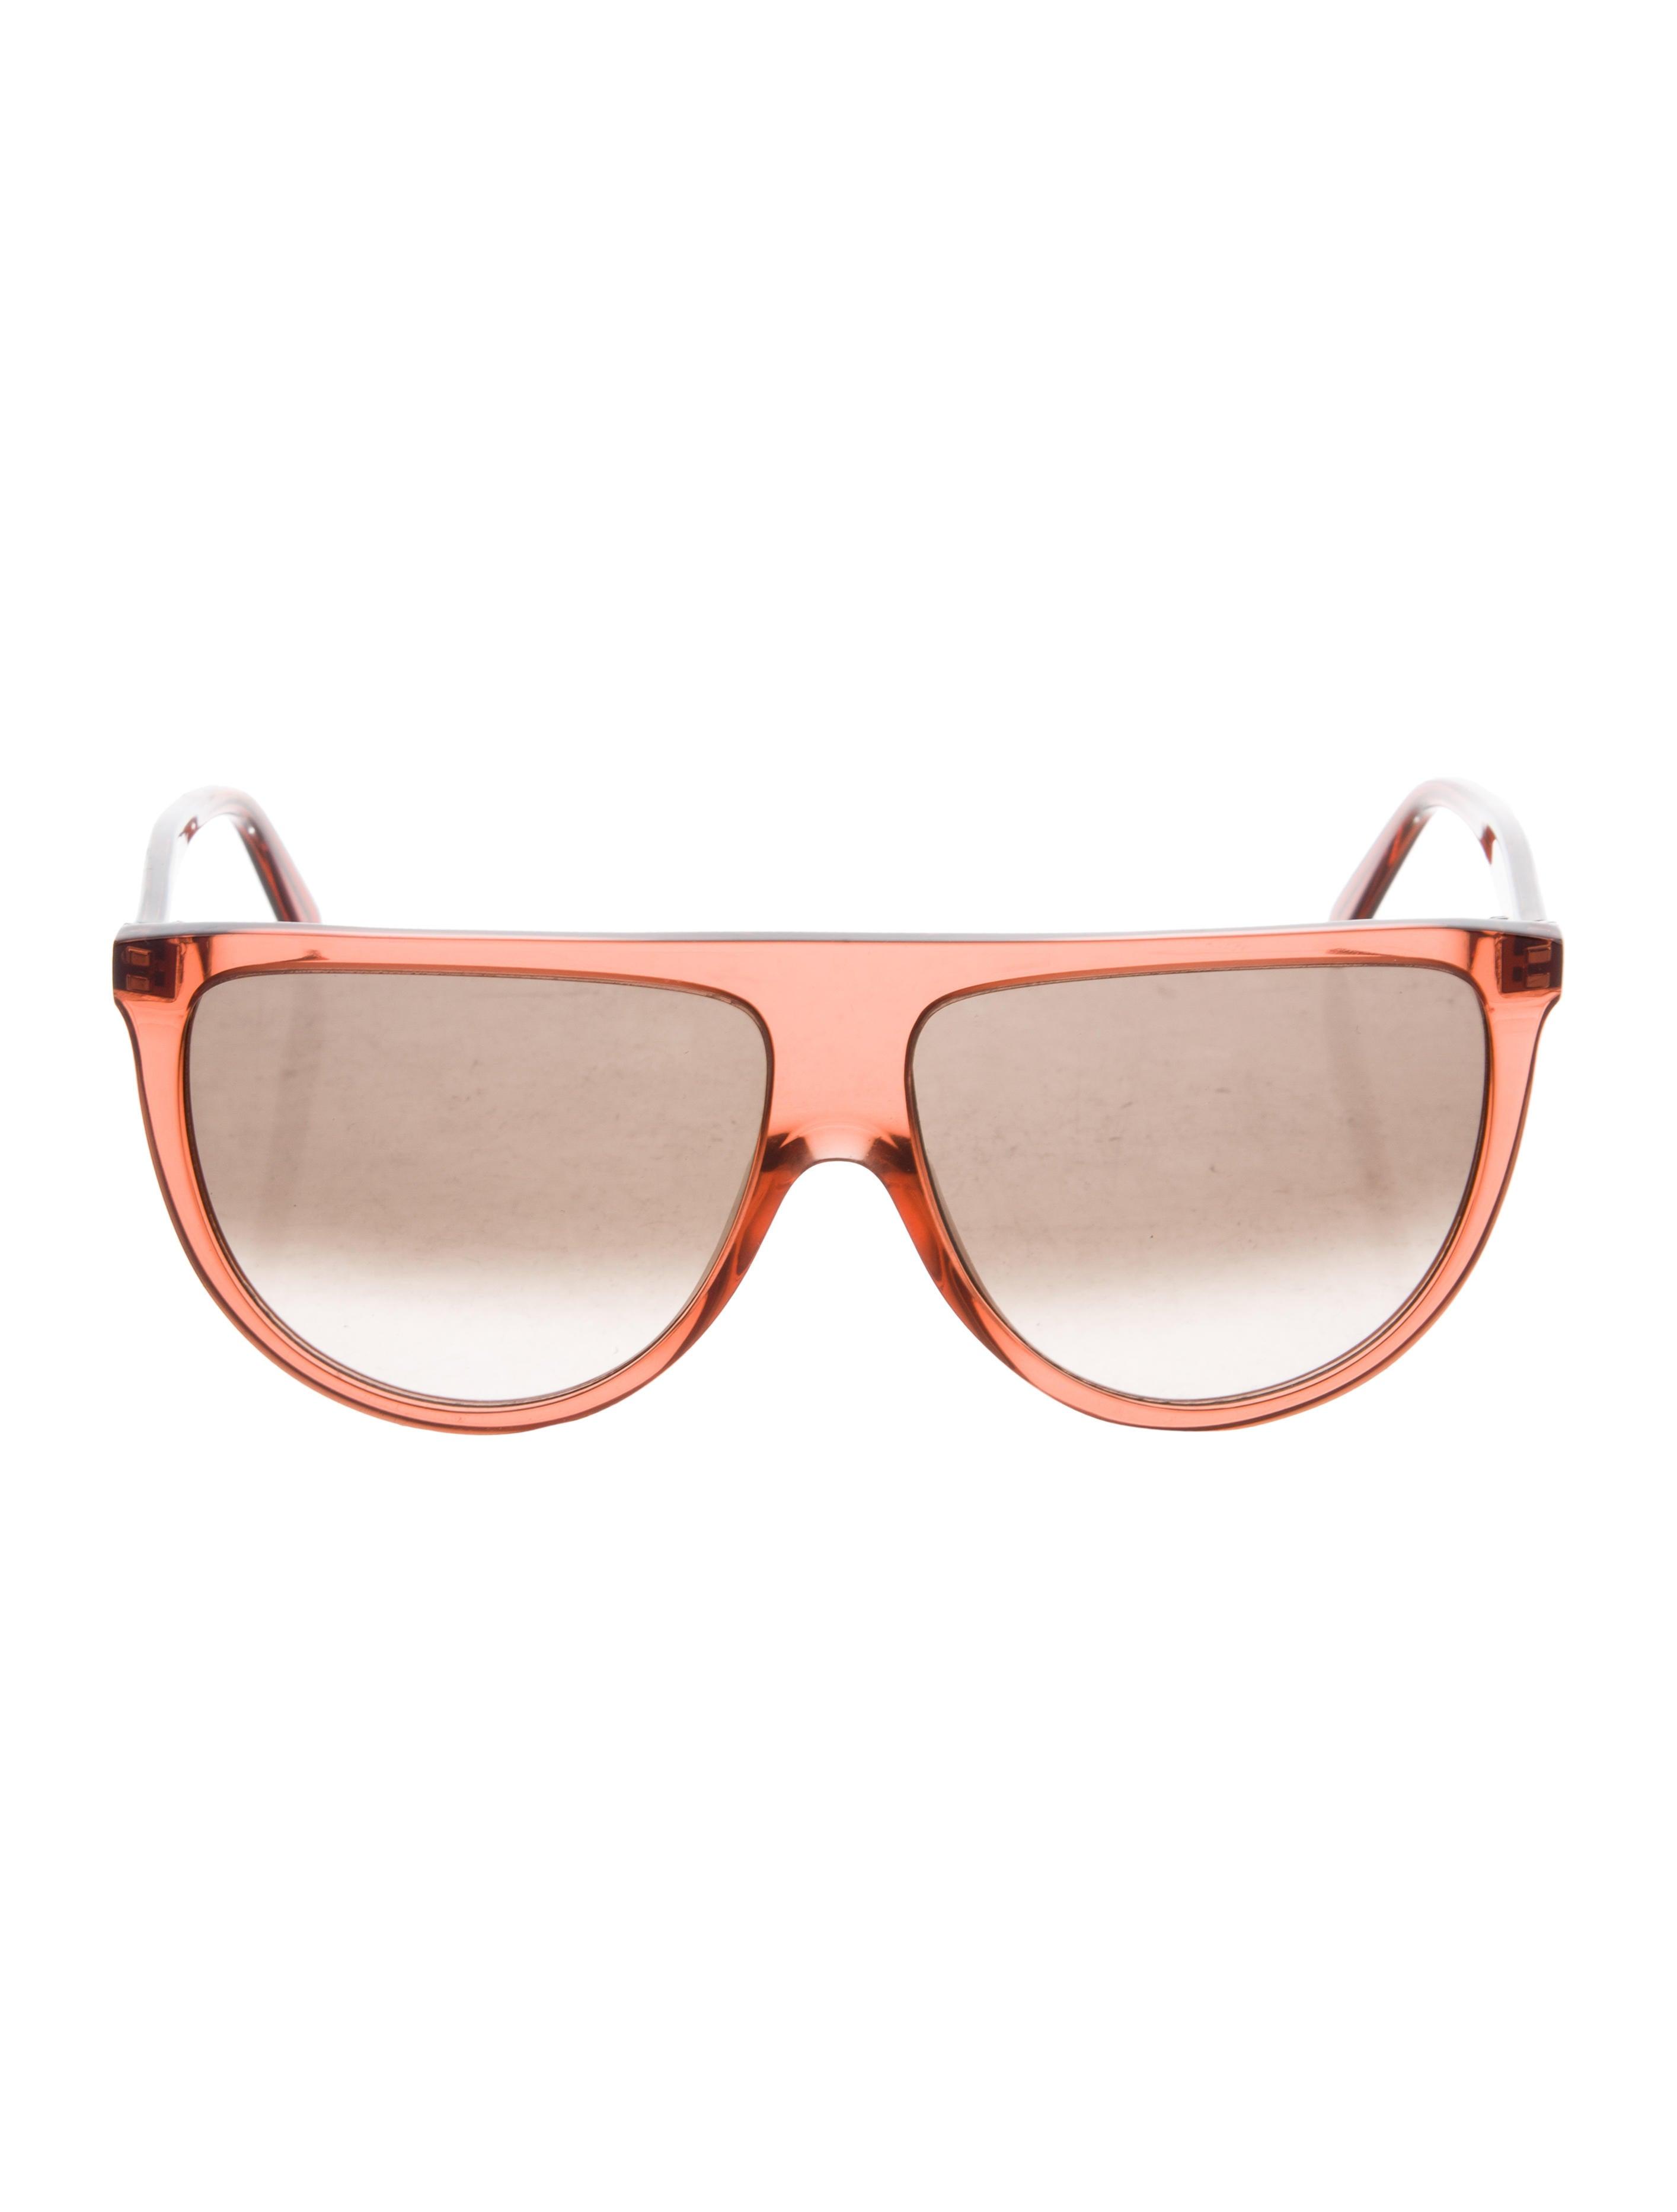 f44bc81a6e3c Céline Thin Shadow Sunglasses - Accessories - CEL77338